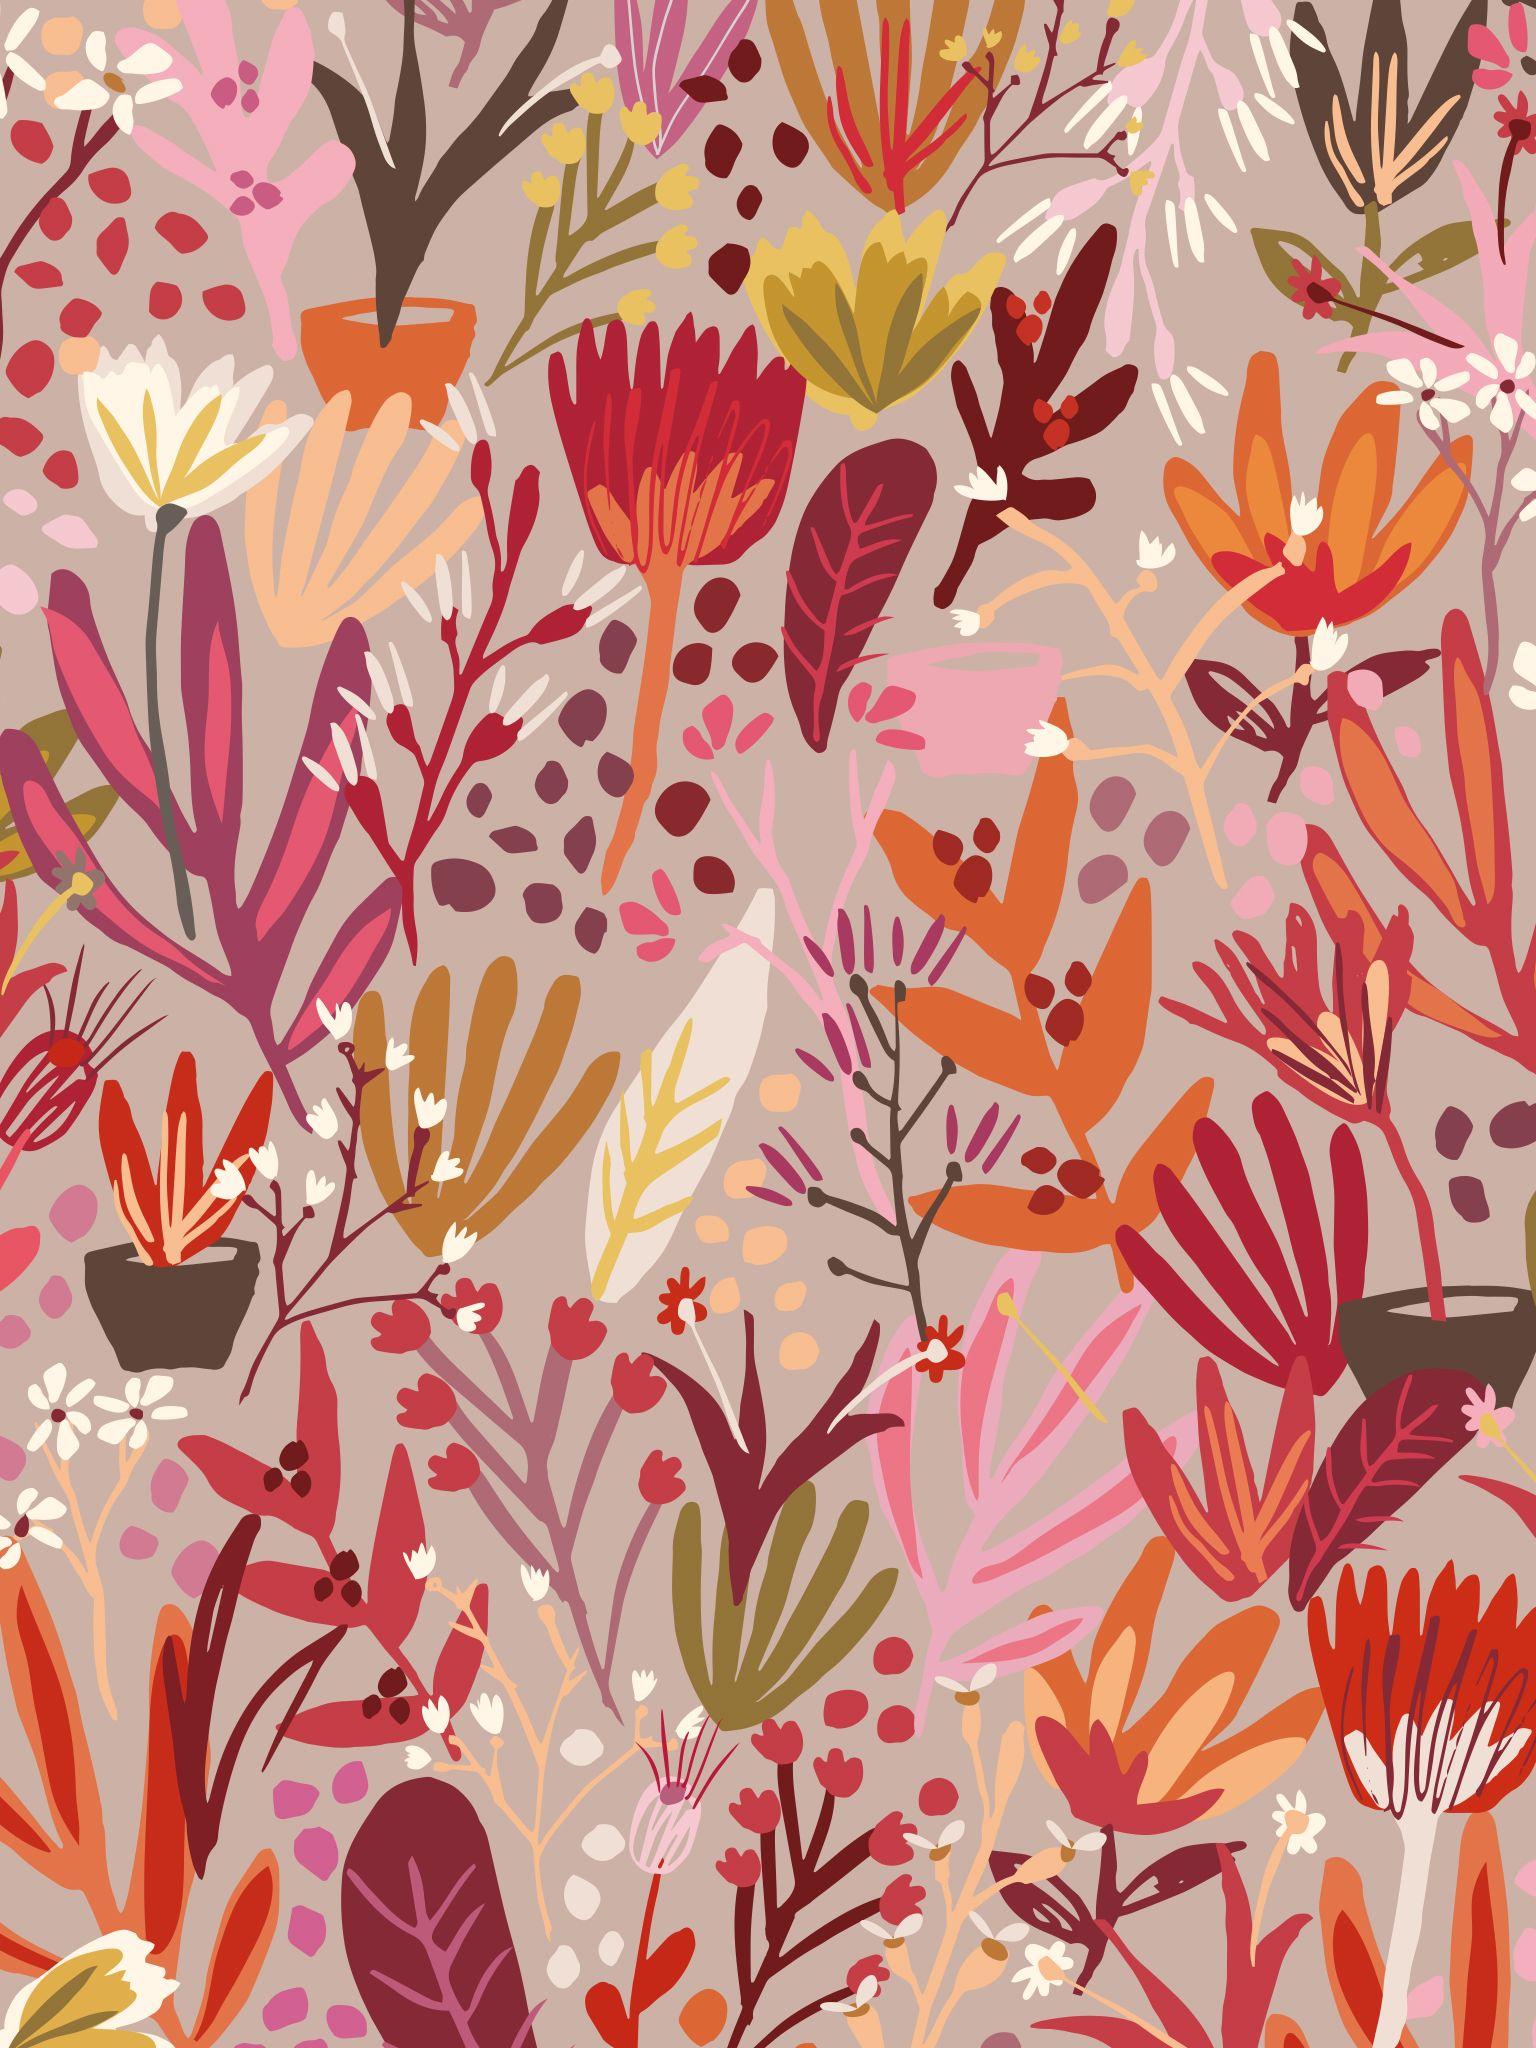 Free IPAD / TABLET wallpapers download Caroline Gardner